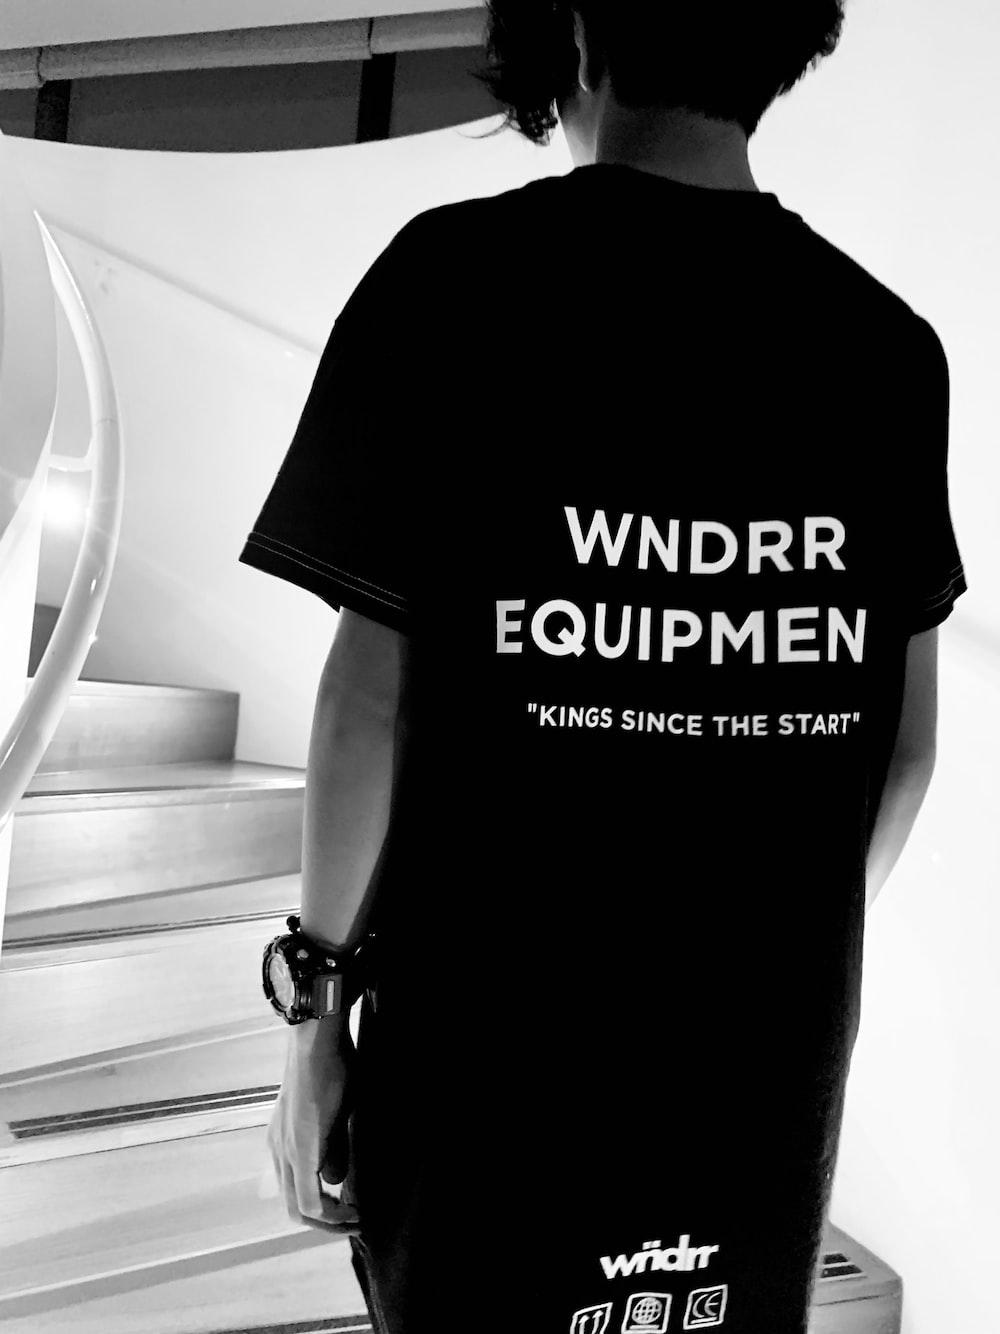 black and white crew neck t-shirt